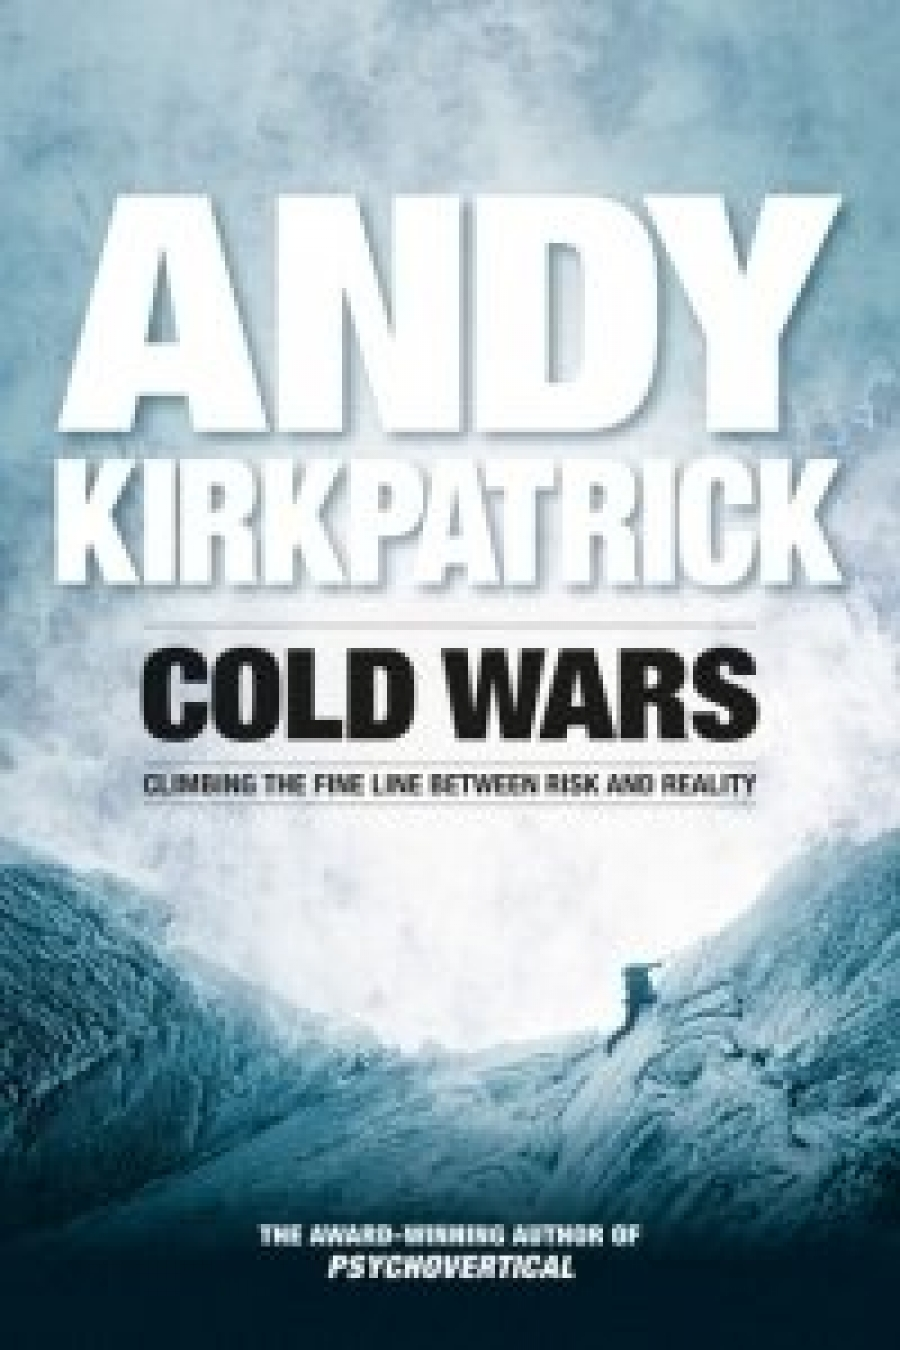 Andy Kirkpatrick - Cold Wars